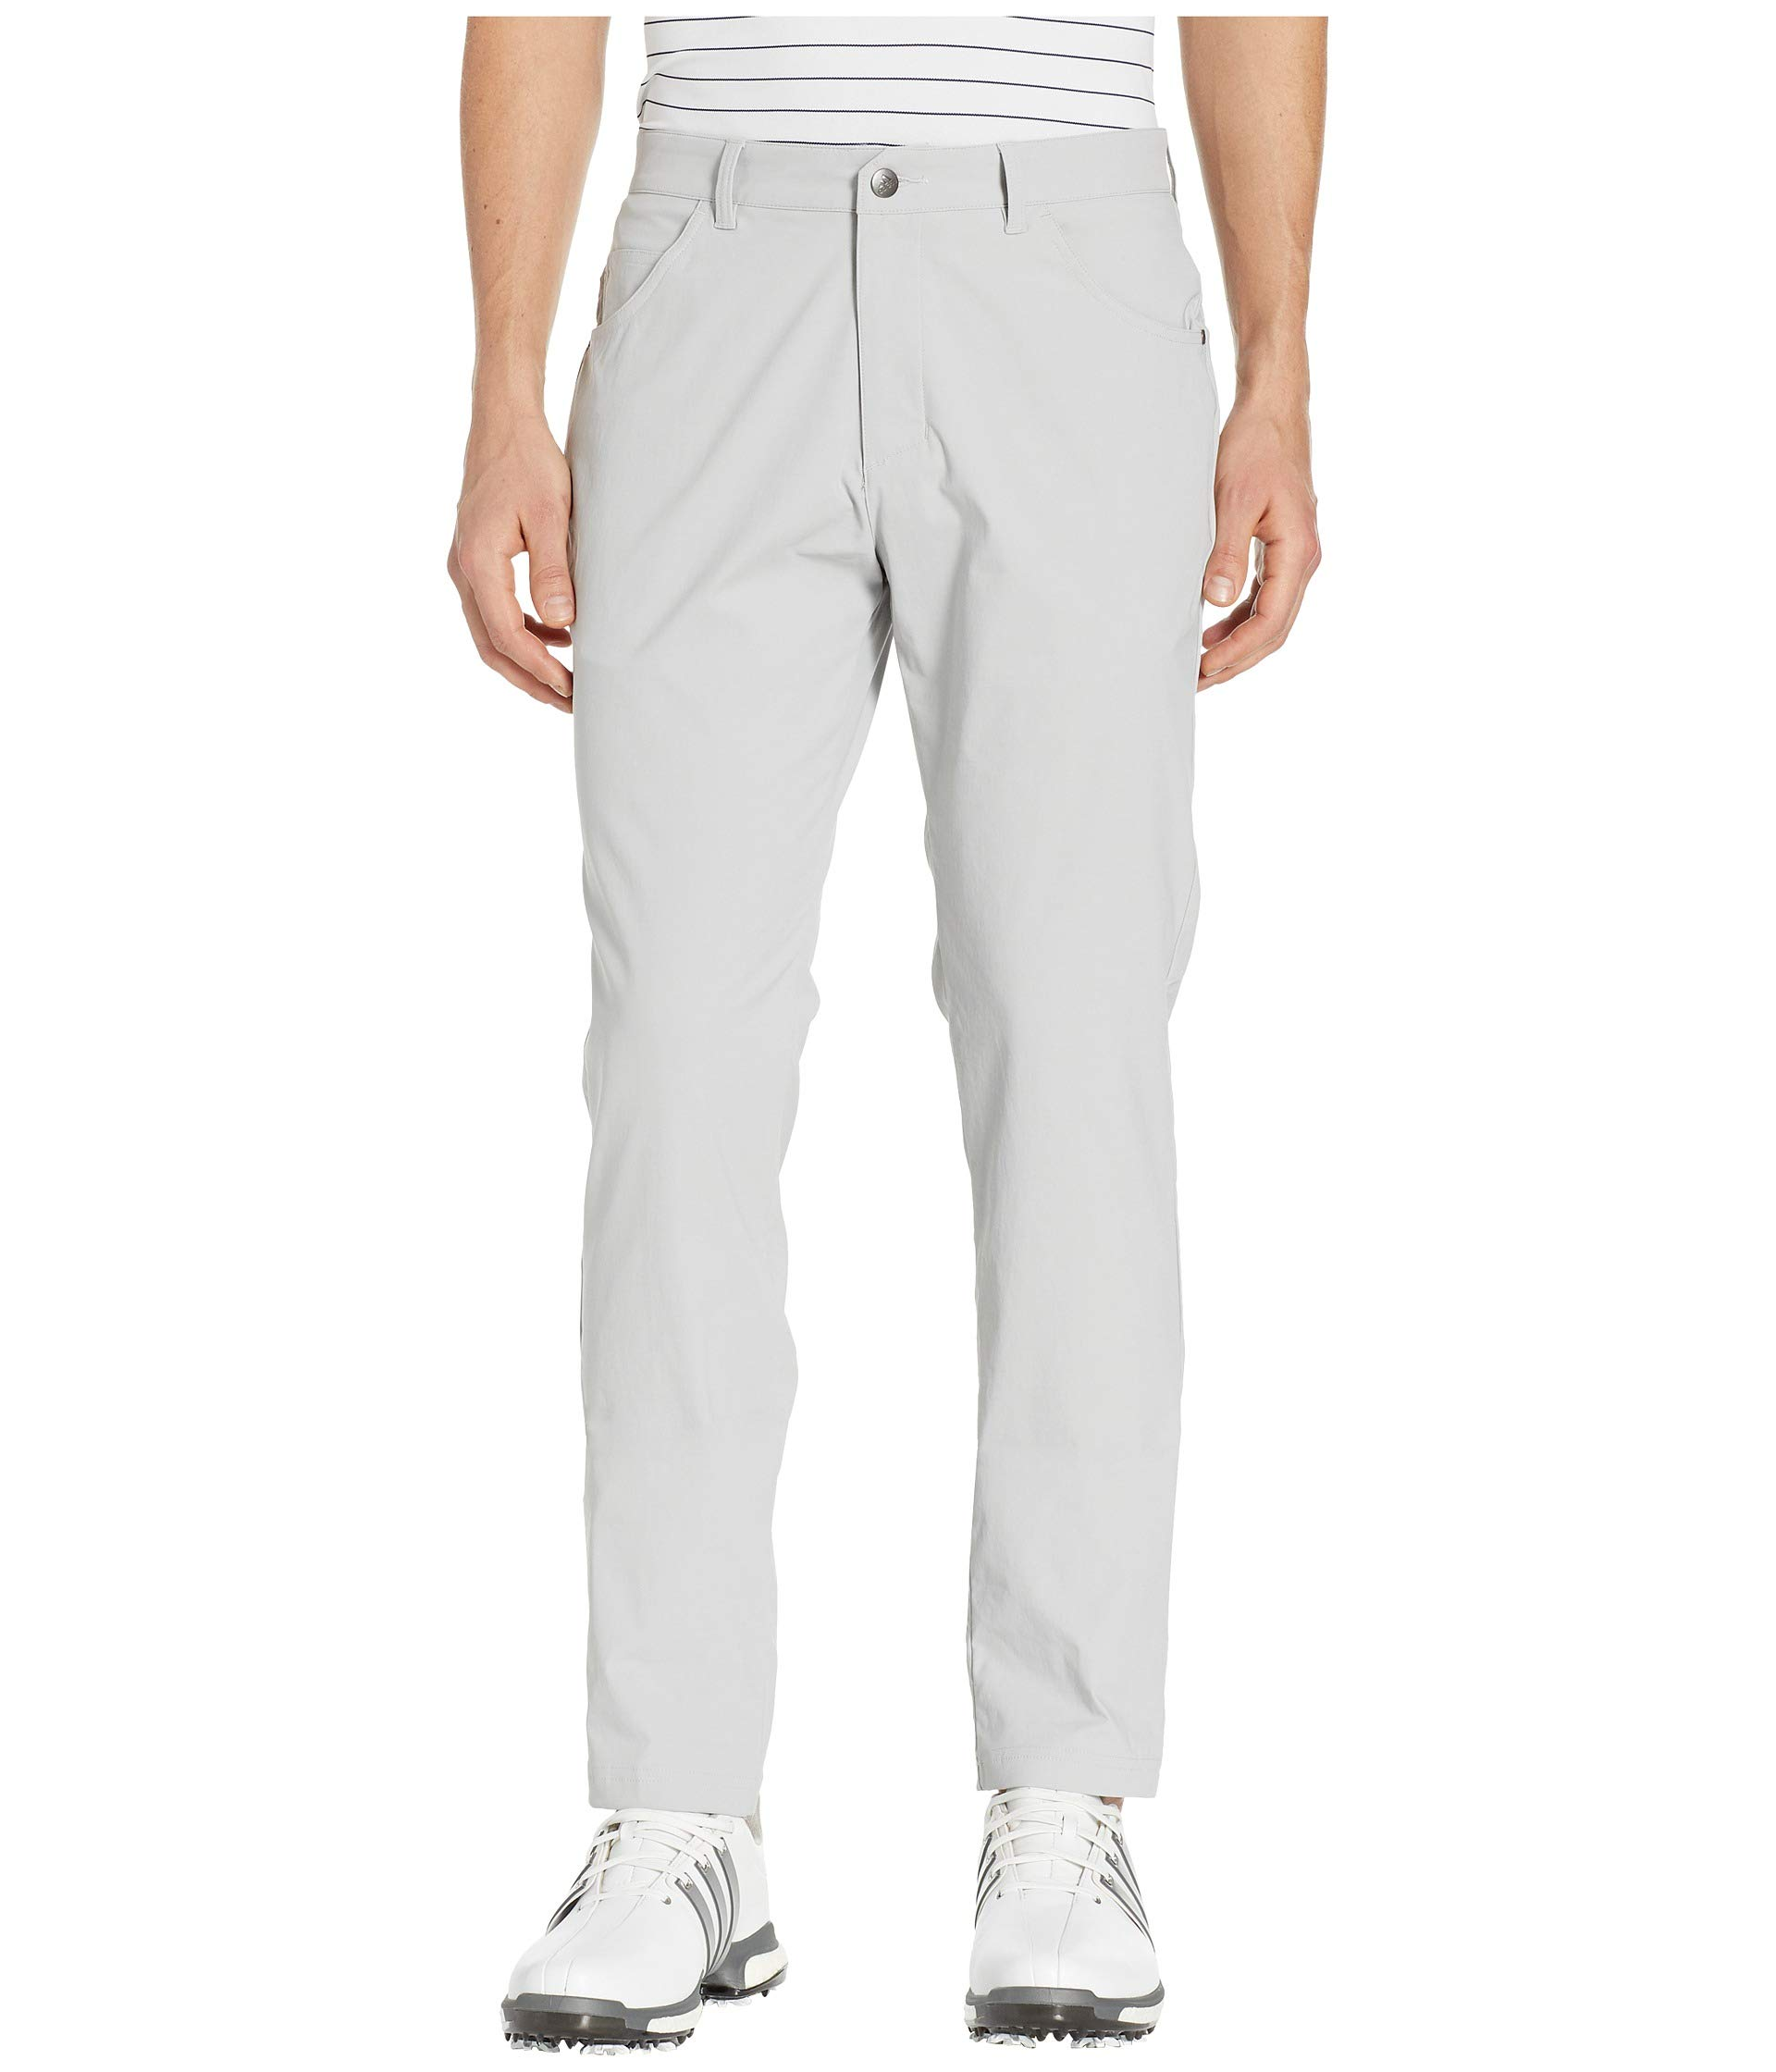 adidas Golf Adicross Beyond 18 Slim 5-Pocket Pant, Grey Two, 3030